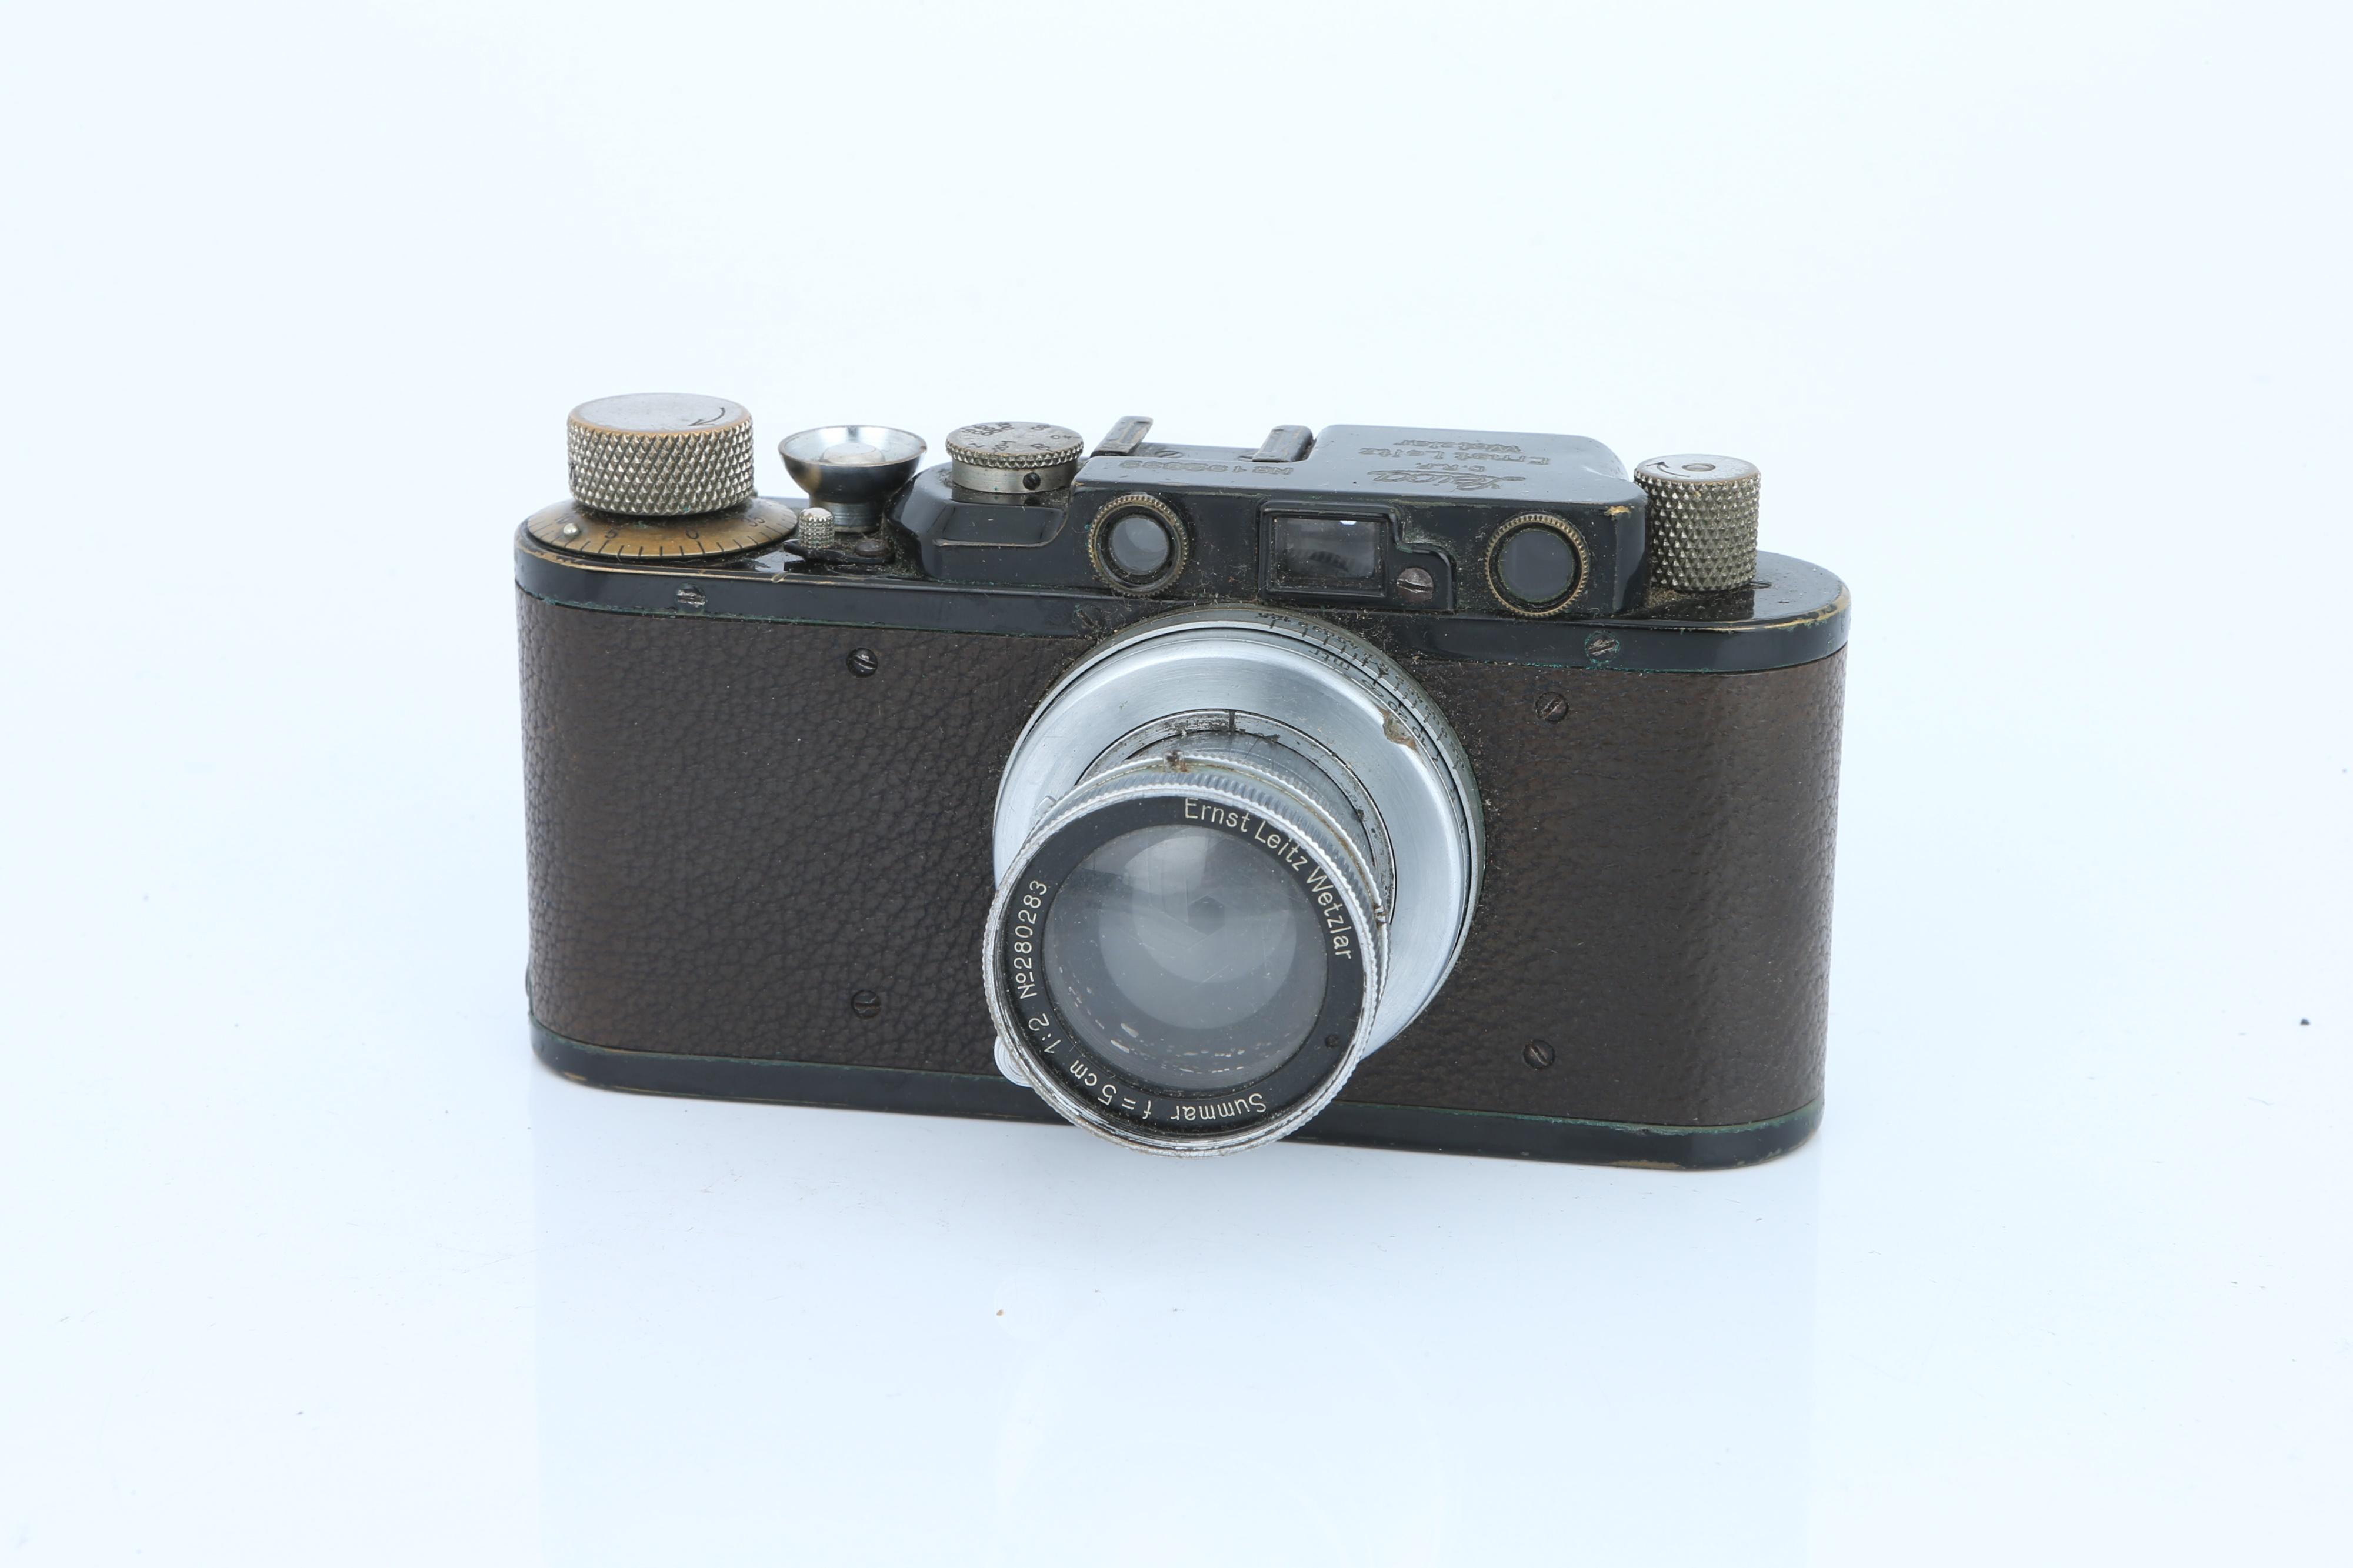 A Leica II Rangefinder Camera, - Image 2 of 3